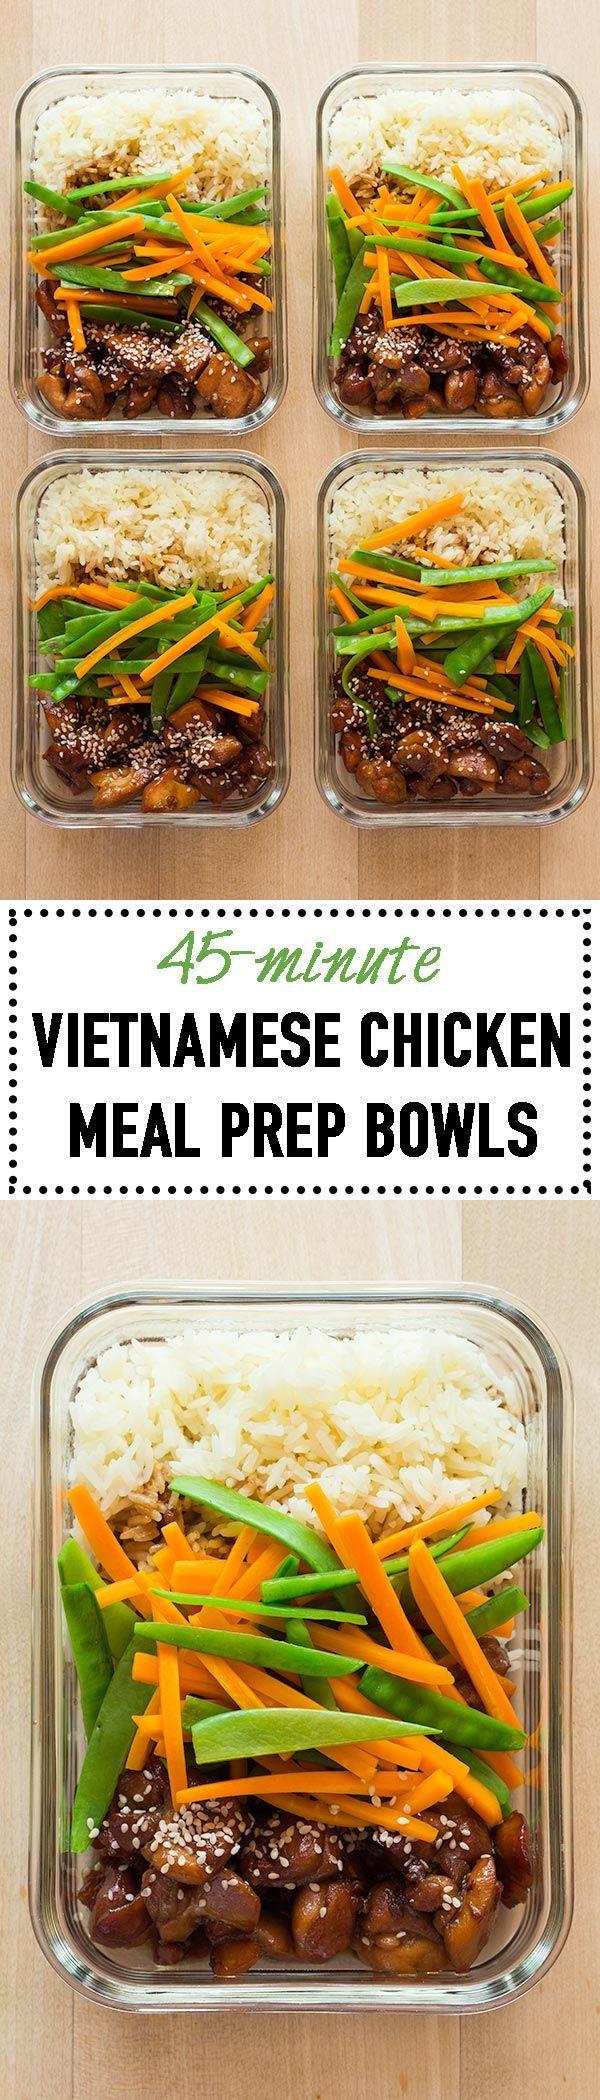 Vietnamese Chicken Meal Prep Bowls via @greenhealthycoo